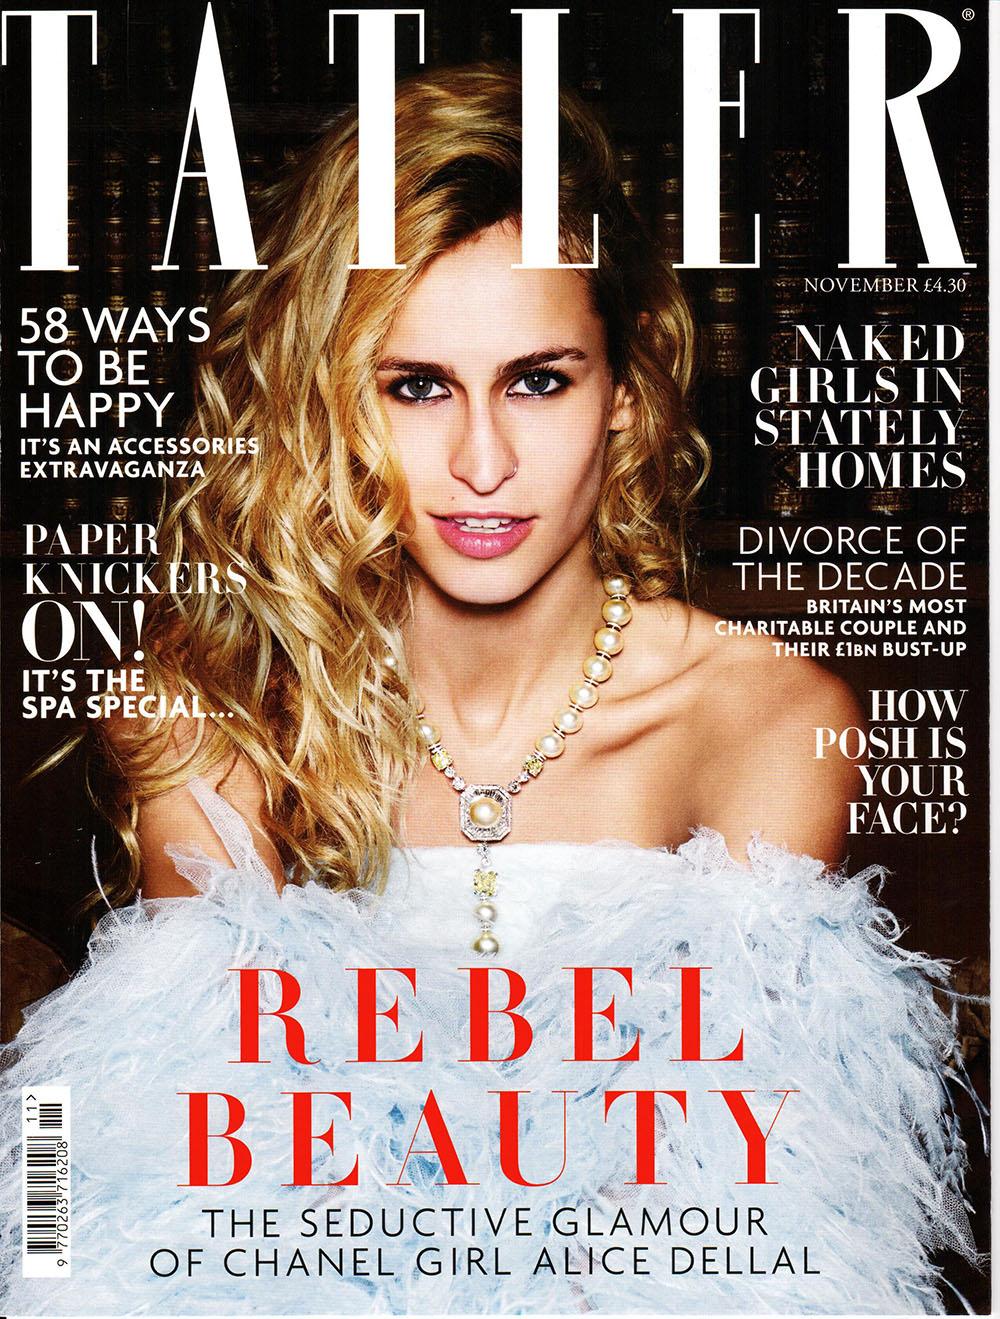 Tatler Nov 2014 cover.jpg